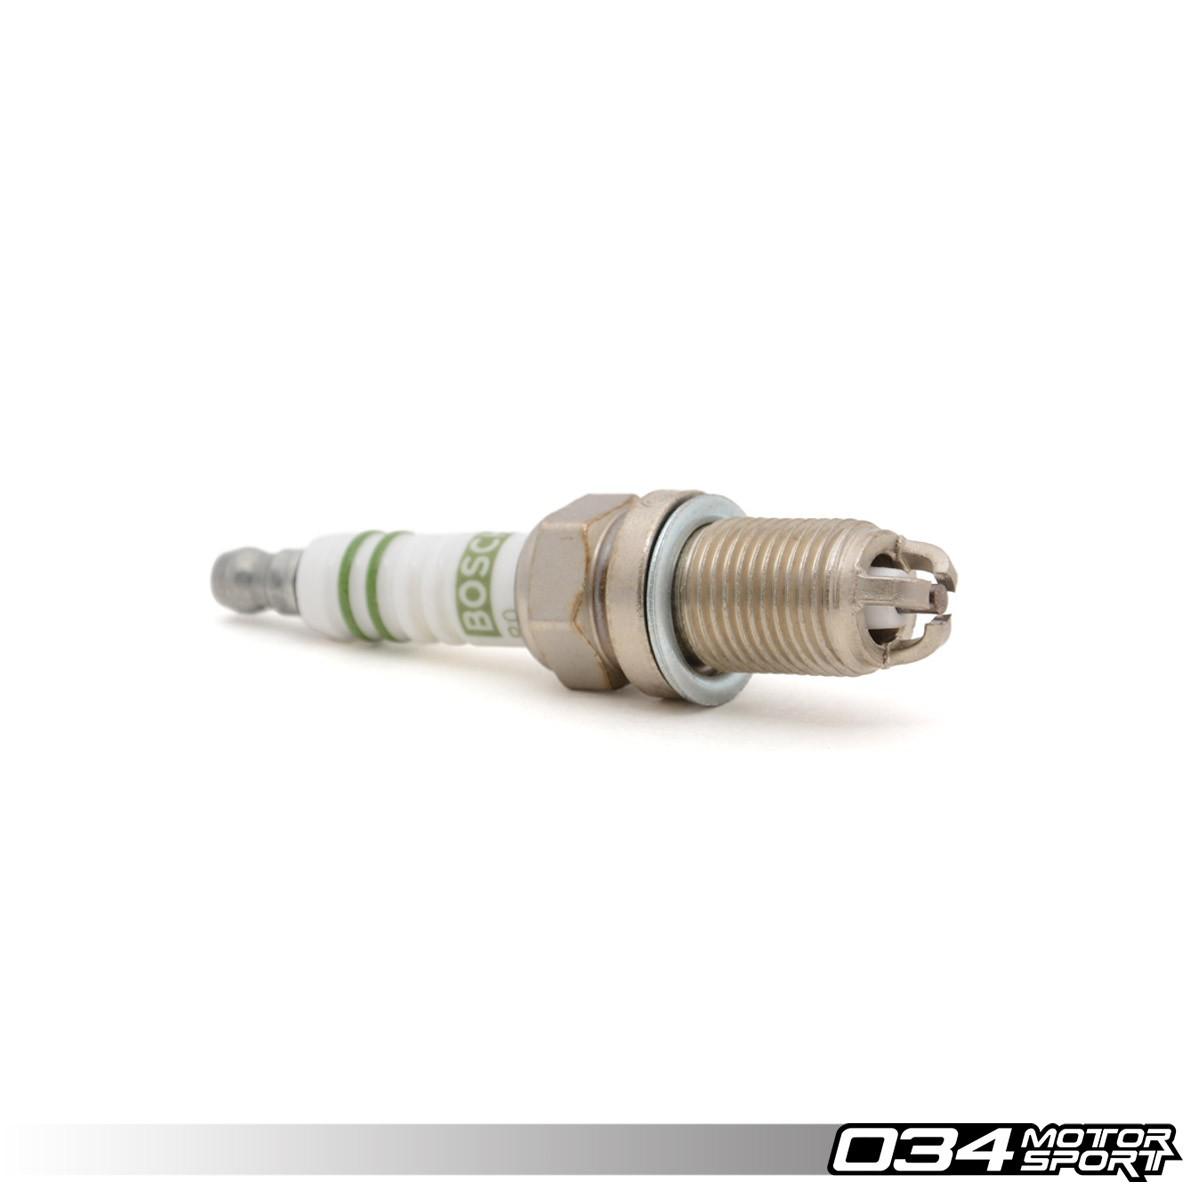 Bosch Tri-Electrode Copper Spark Plug, Heat Range 6, Non-Resistor | 034-107-6001